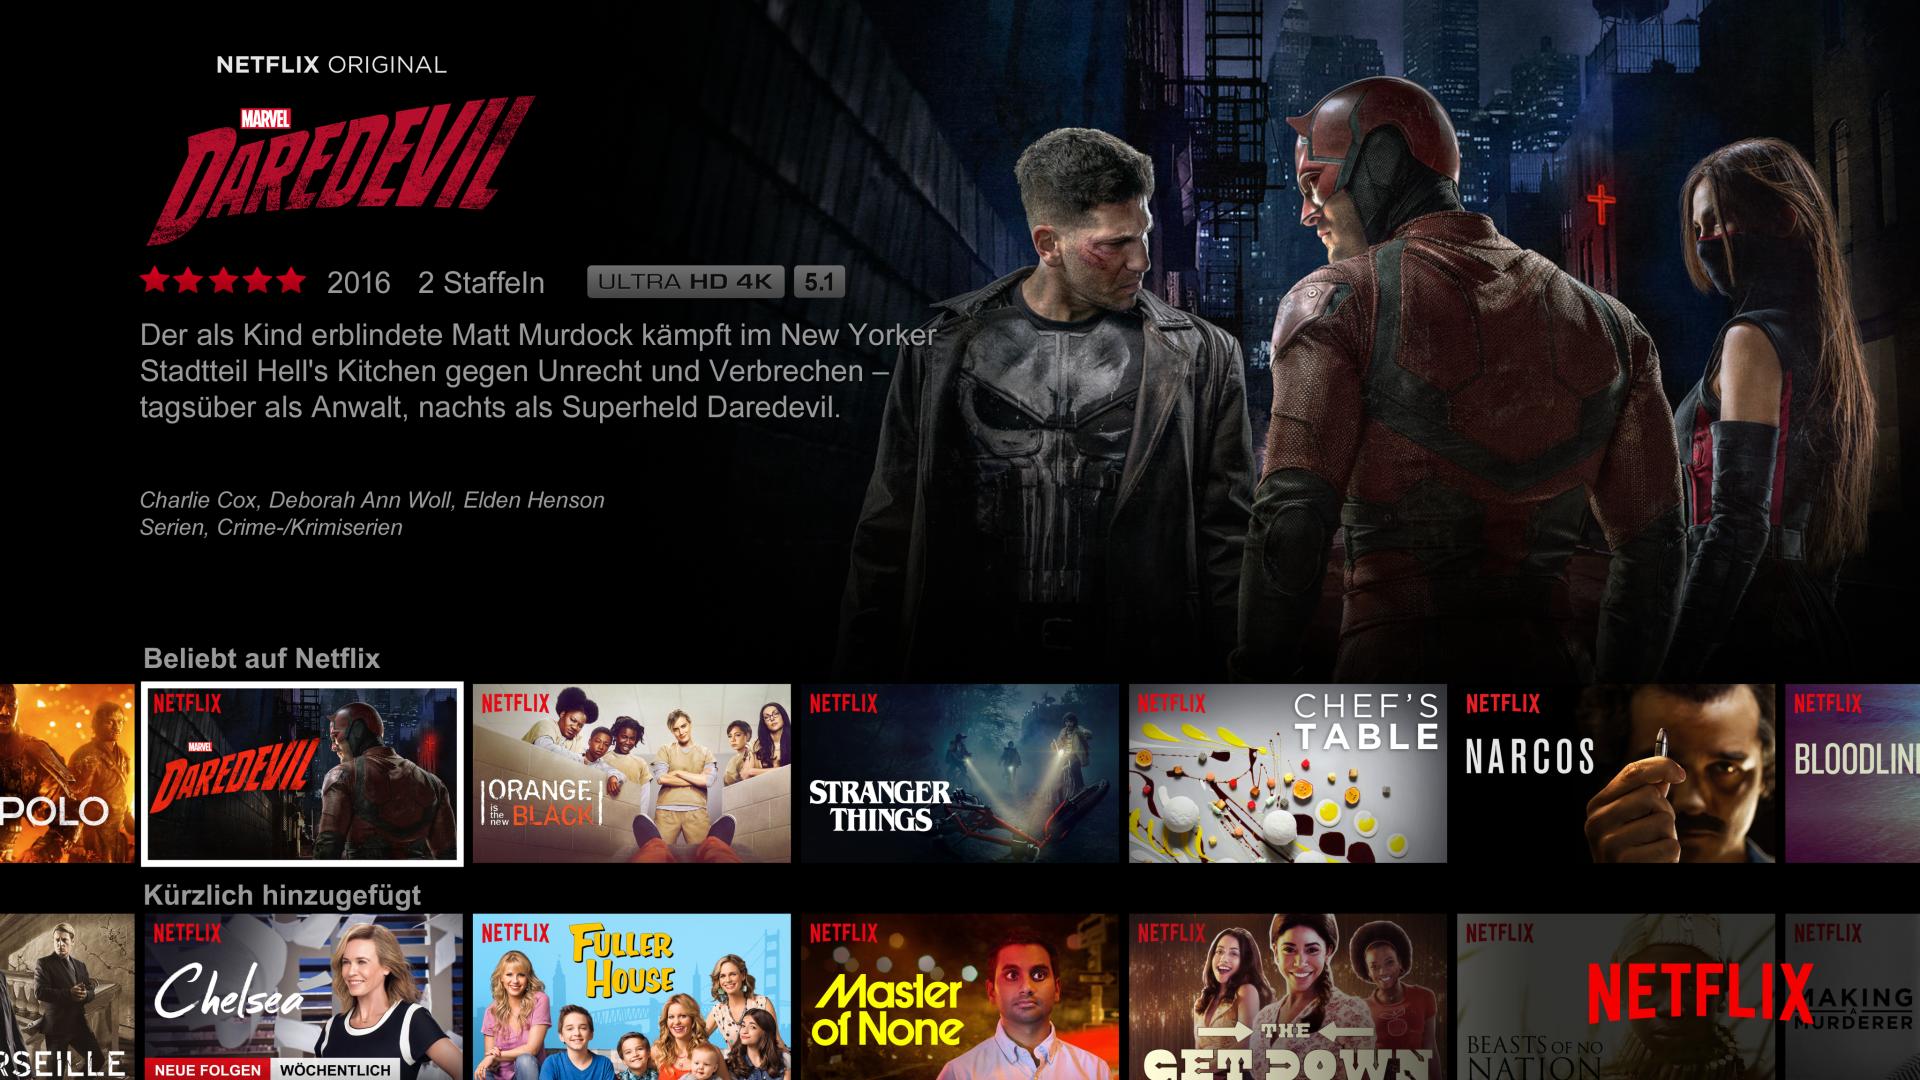 Netflix website featuring Marvel's Daredevil in German.